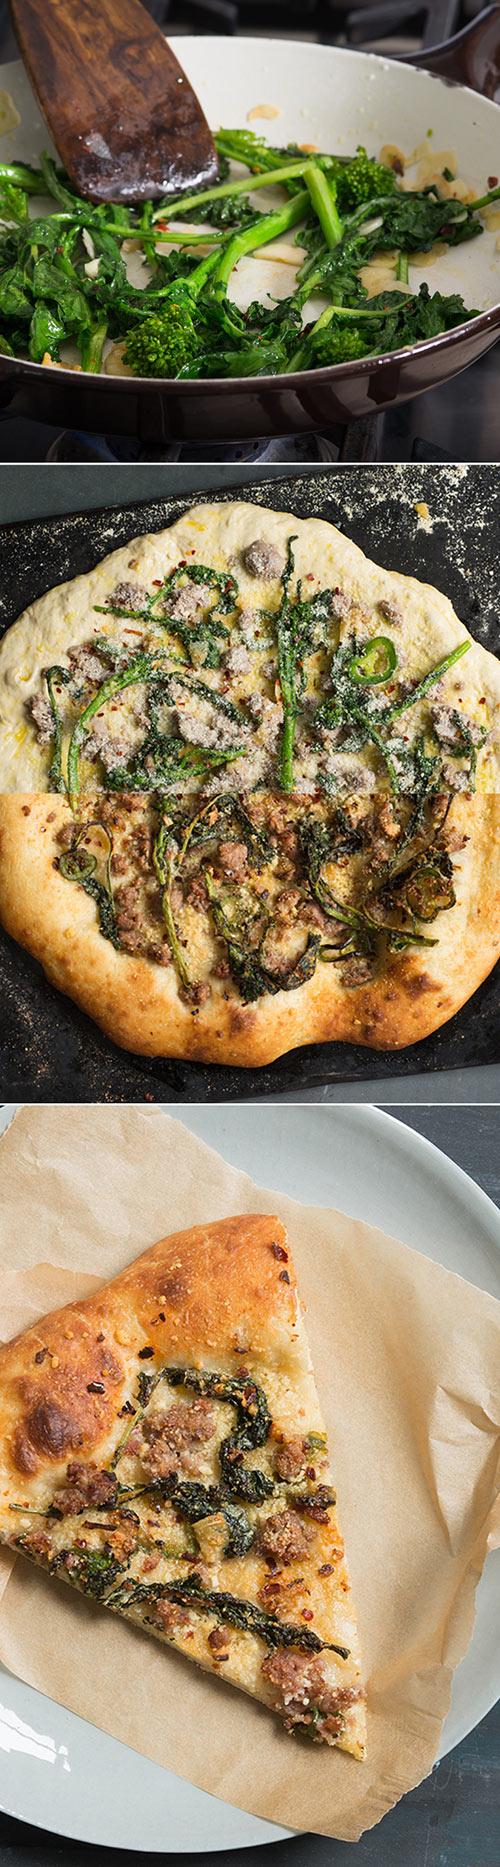 ab-pinterest-process-pizza